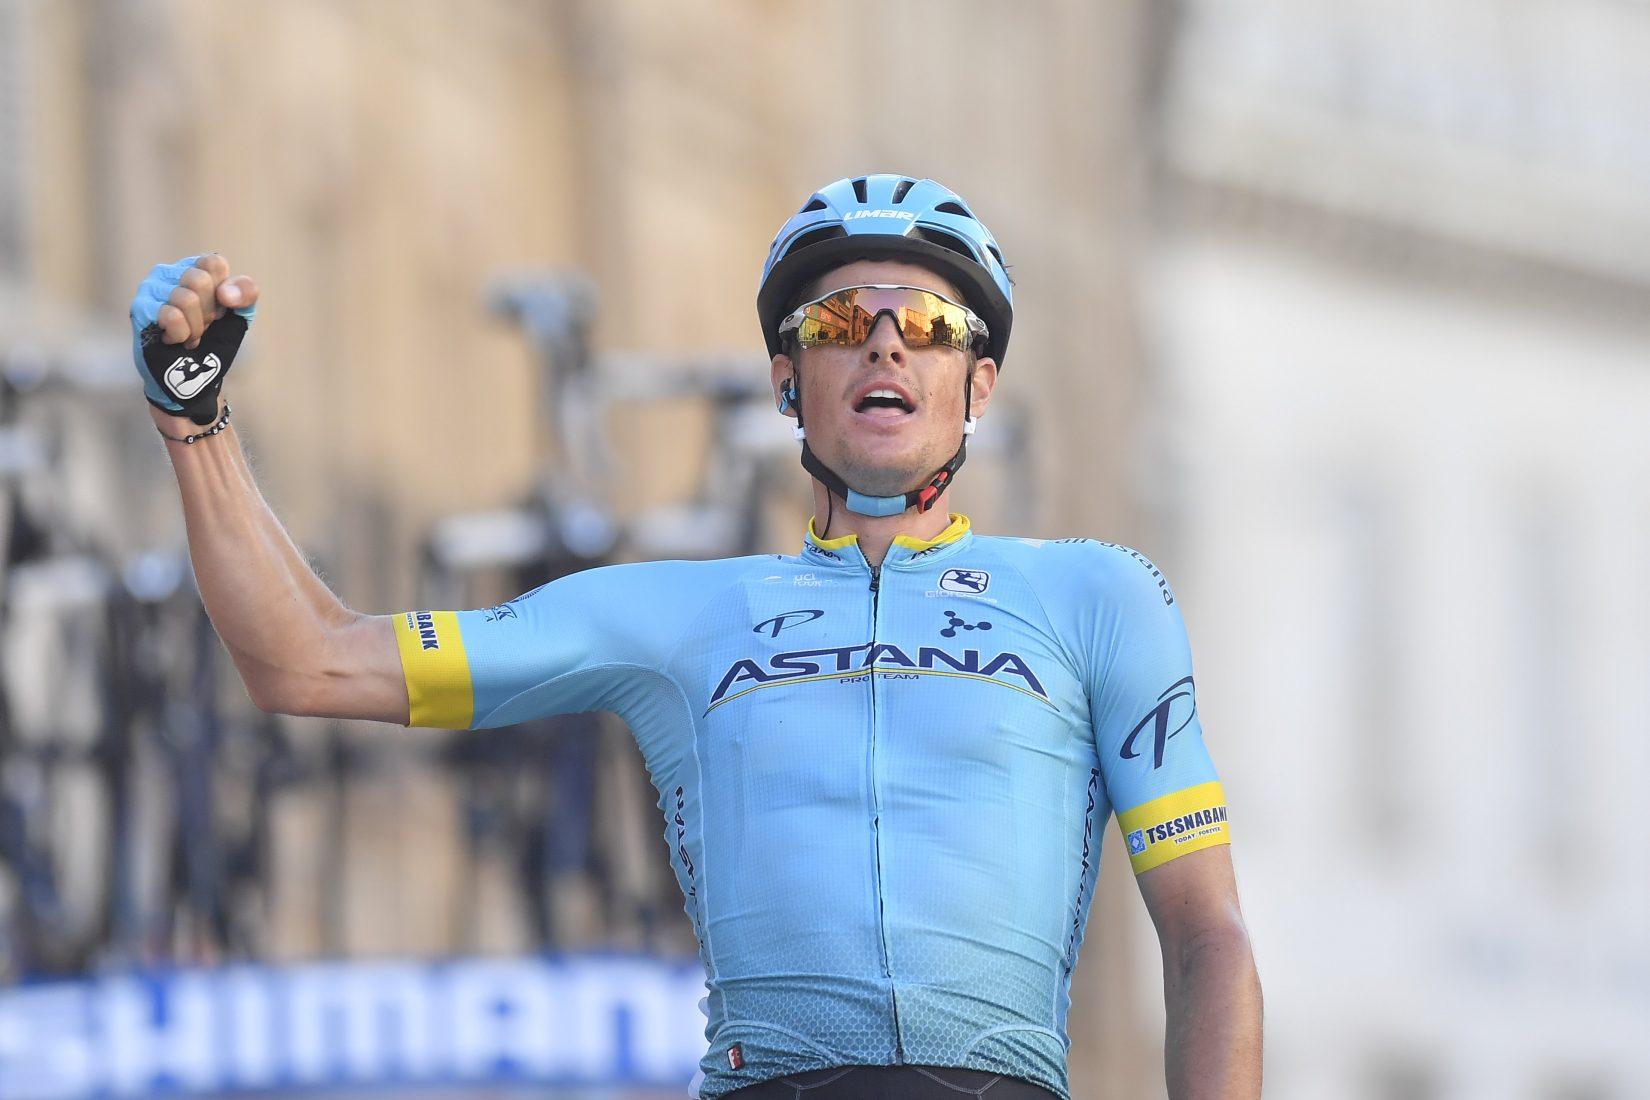 Tirreno-Adriatico: Jakob Fuglsang vince la Tappa 5. Adam Yates ancora azzurro